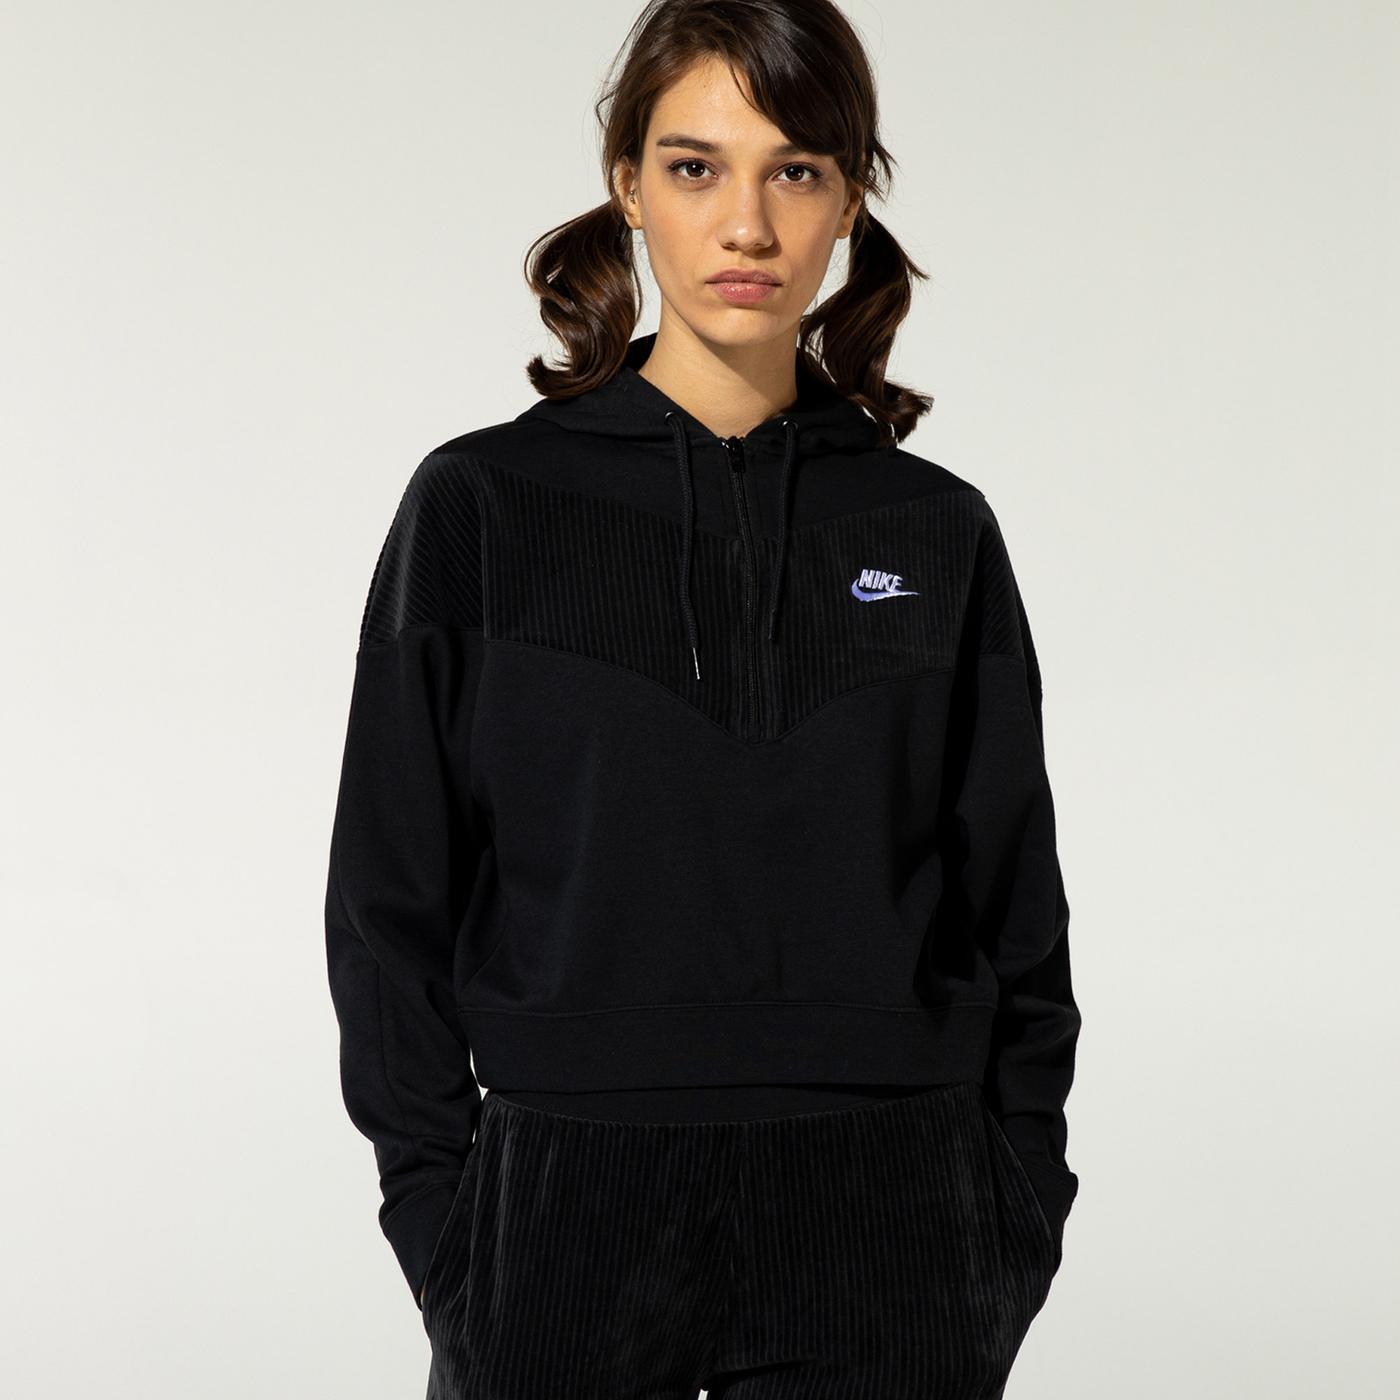 Nike Kadın Kahverengi Sweatshirt